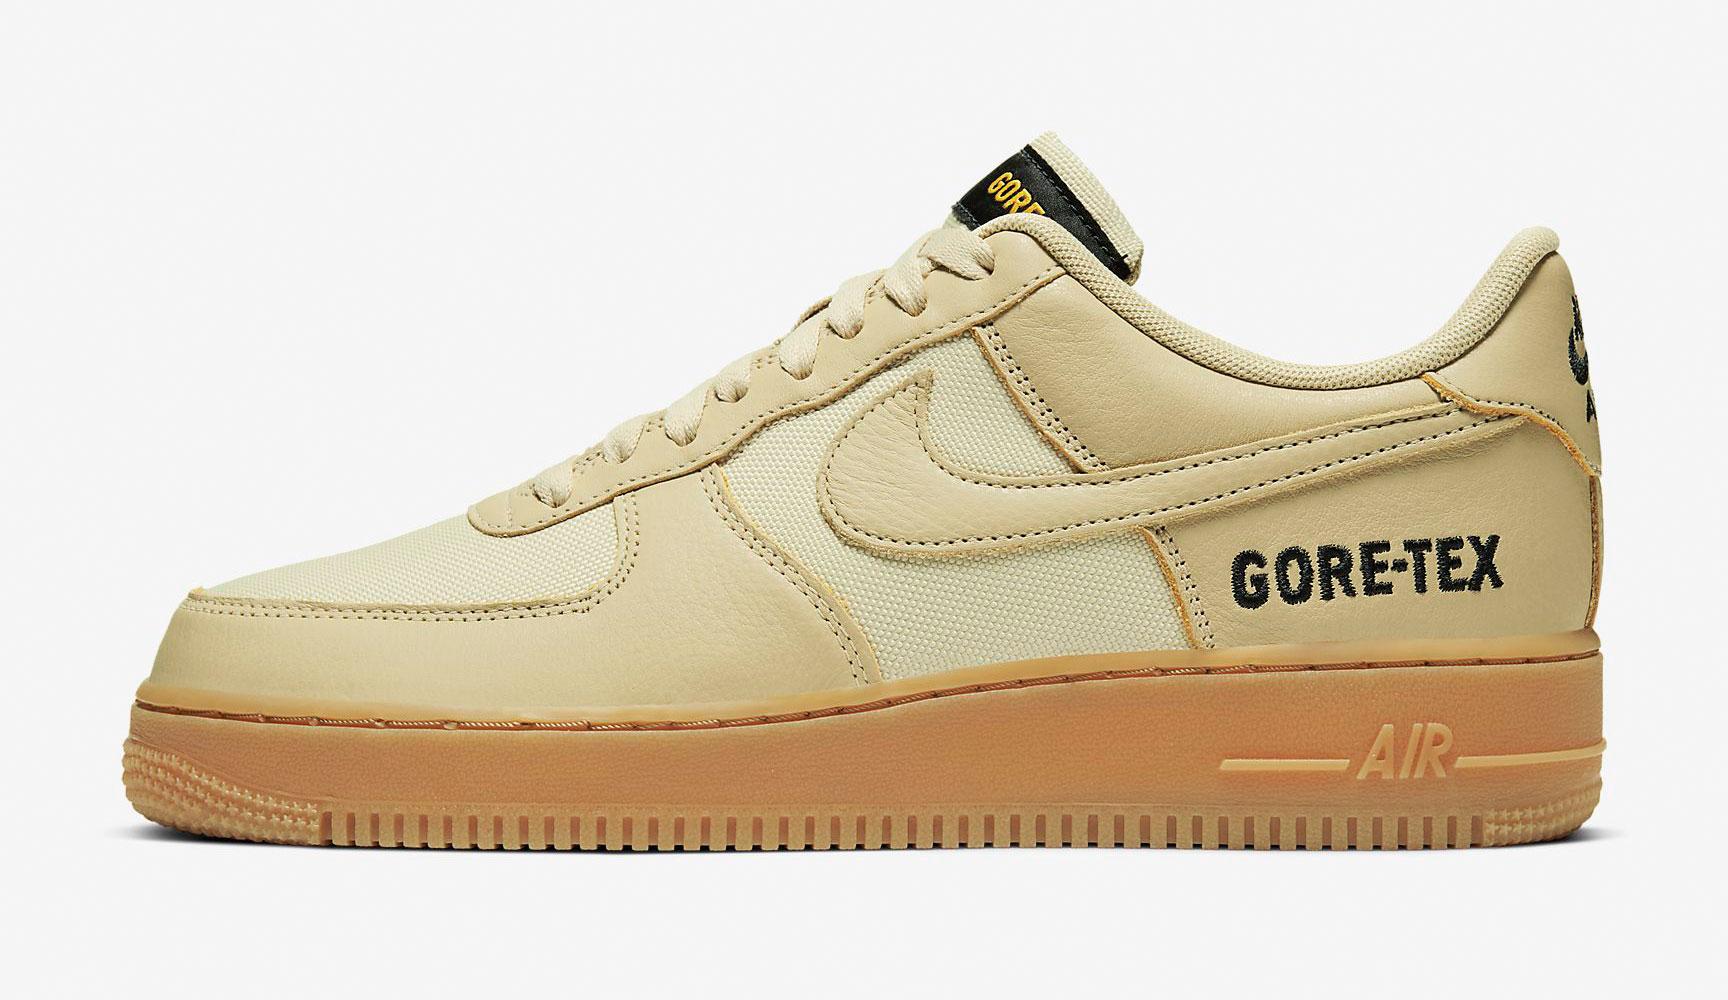 nike-air-force-1-goretex-gold-release-date